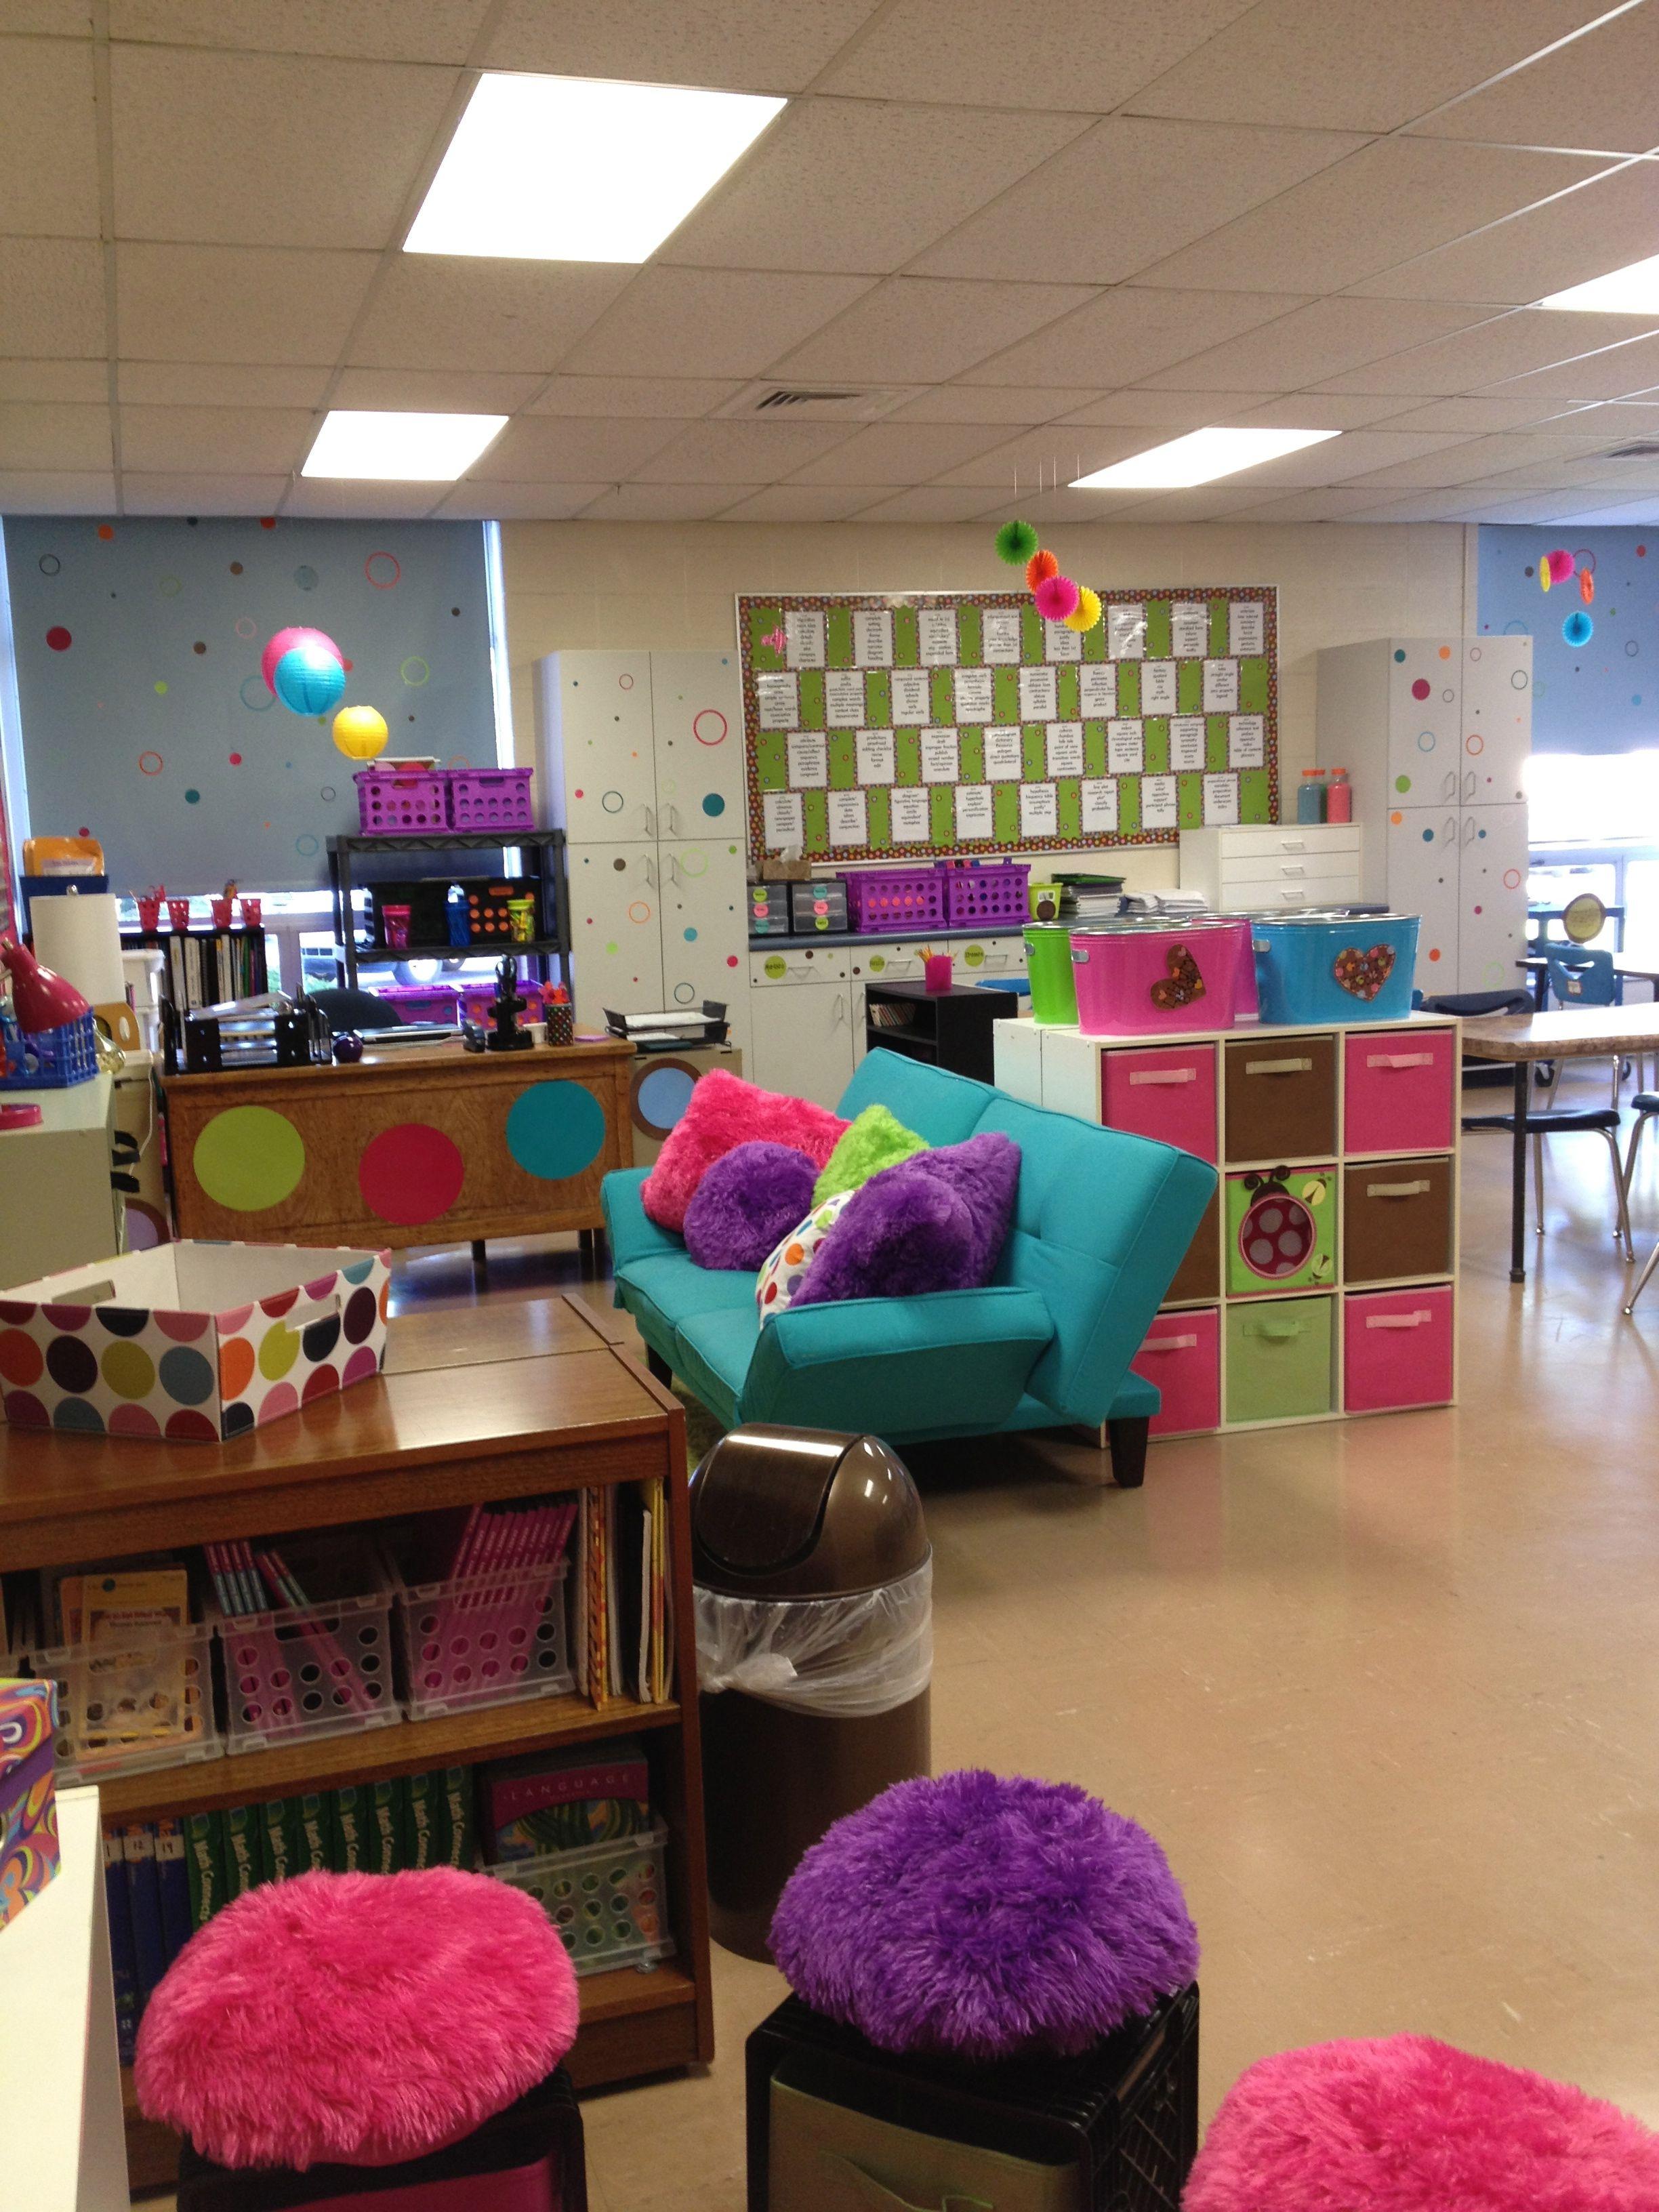 A fourth grade classroom I love the